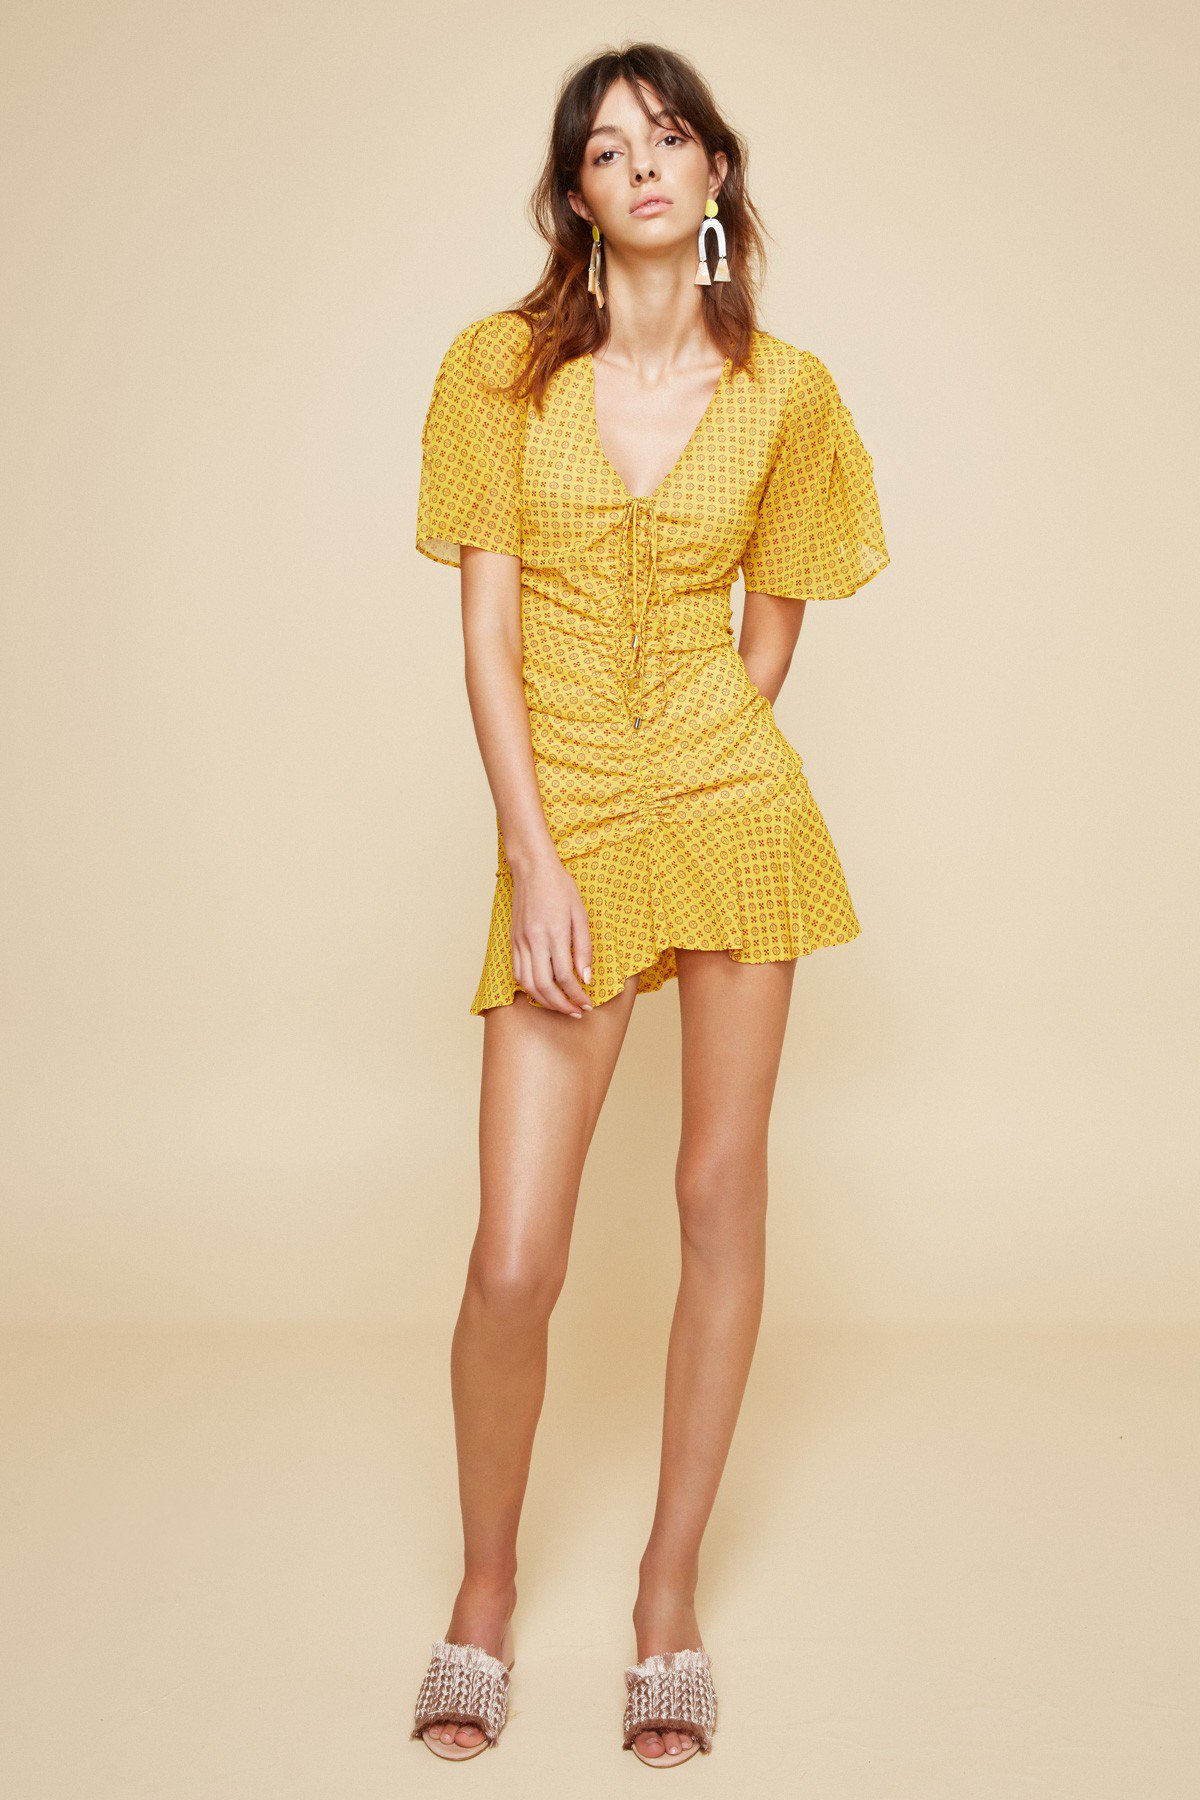 C/MEO Light Up S/S Dress